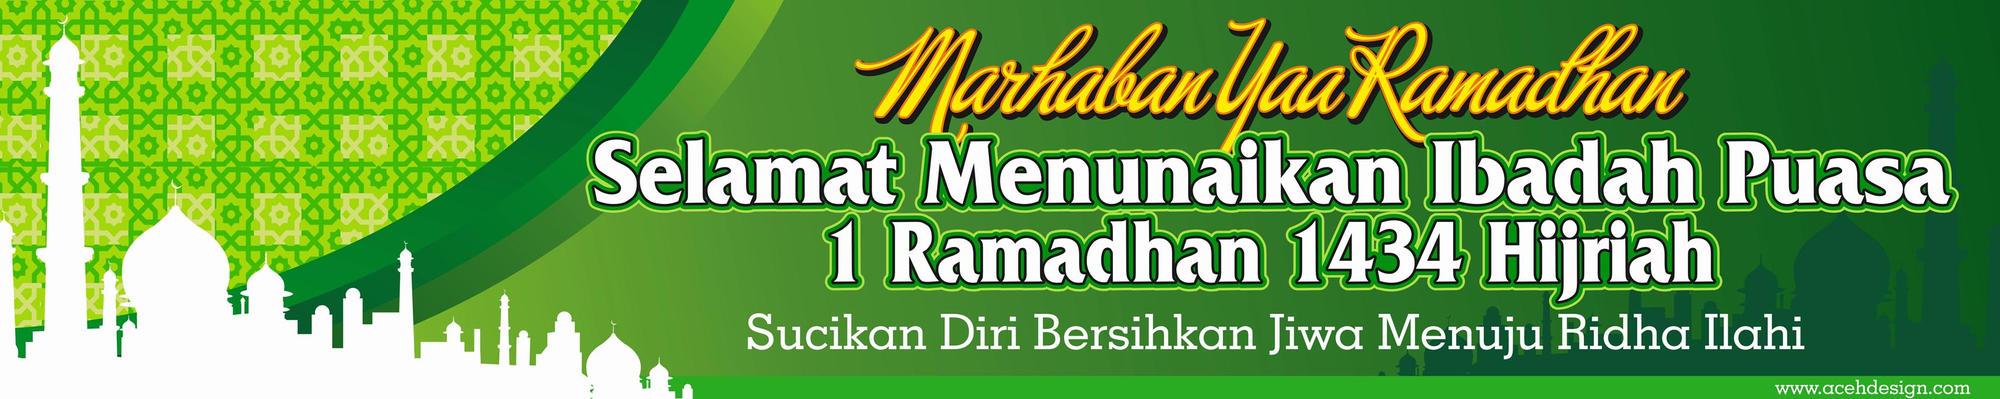 Free Download: Banner Ramadhan 1434 H (corelDRAW)